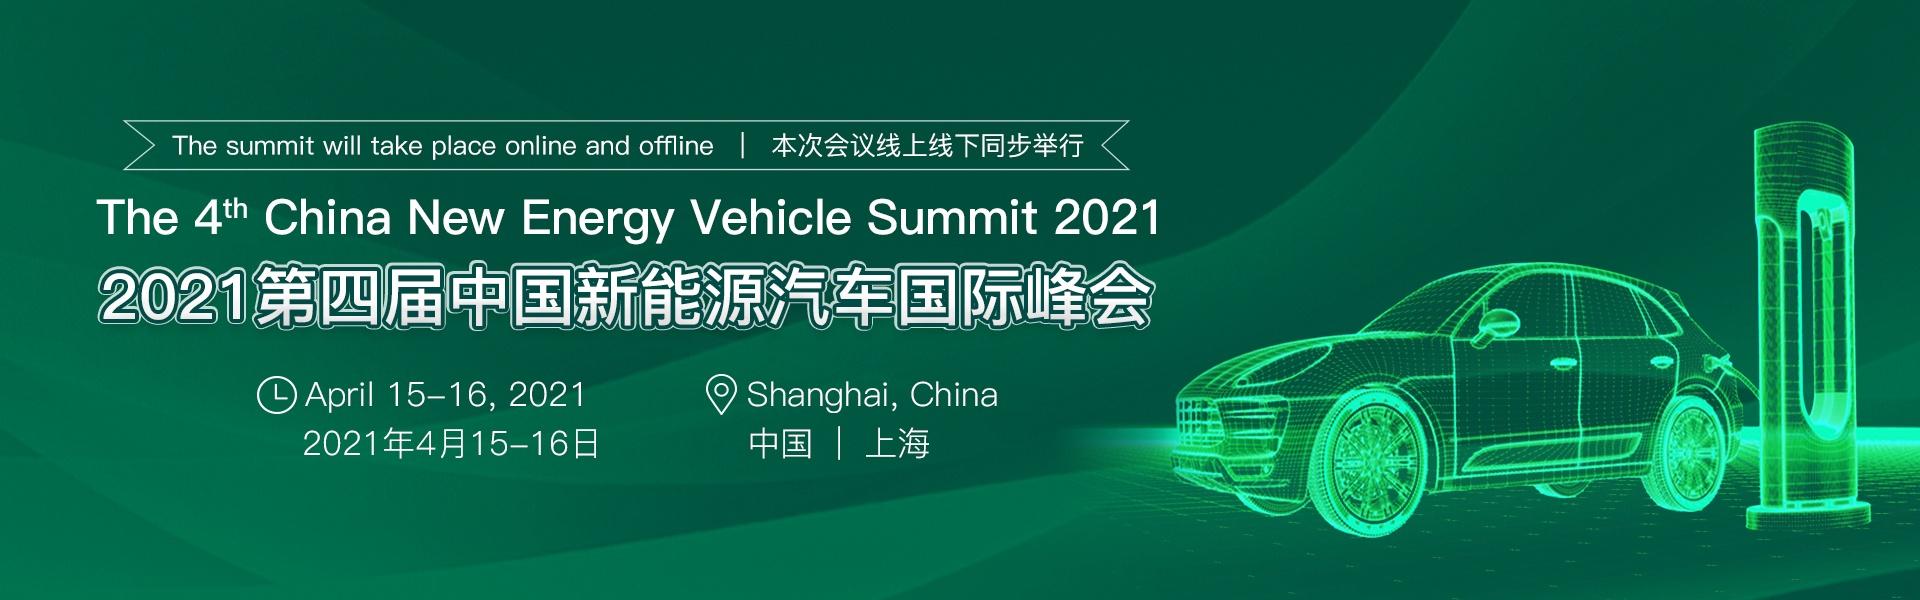 GaN technology at the China New Energy Vehicle Summit